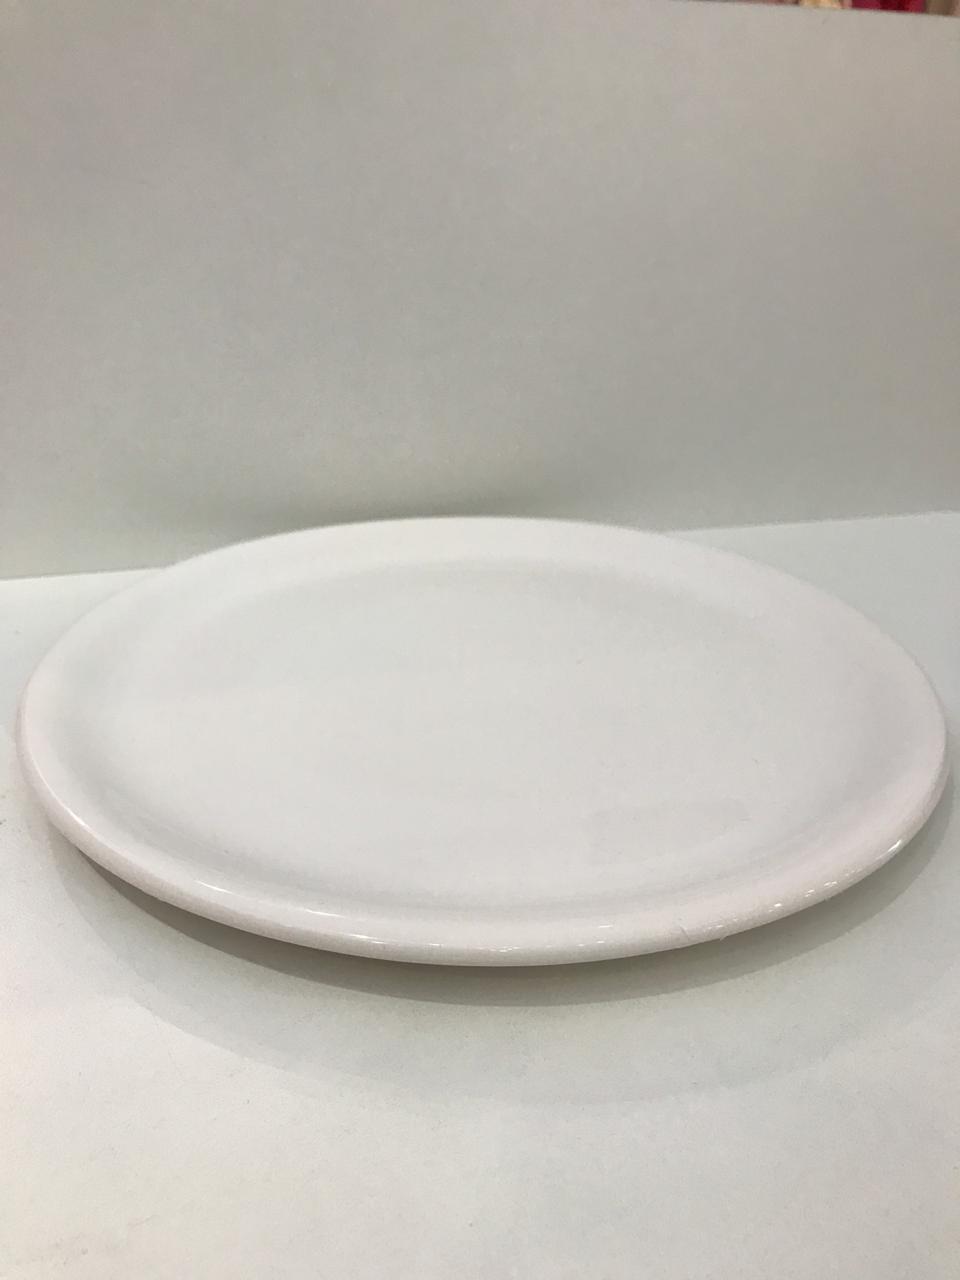 Bandeja Porcelana Redonda Branca 1 UND - Rossi Niero